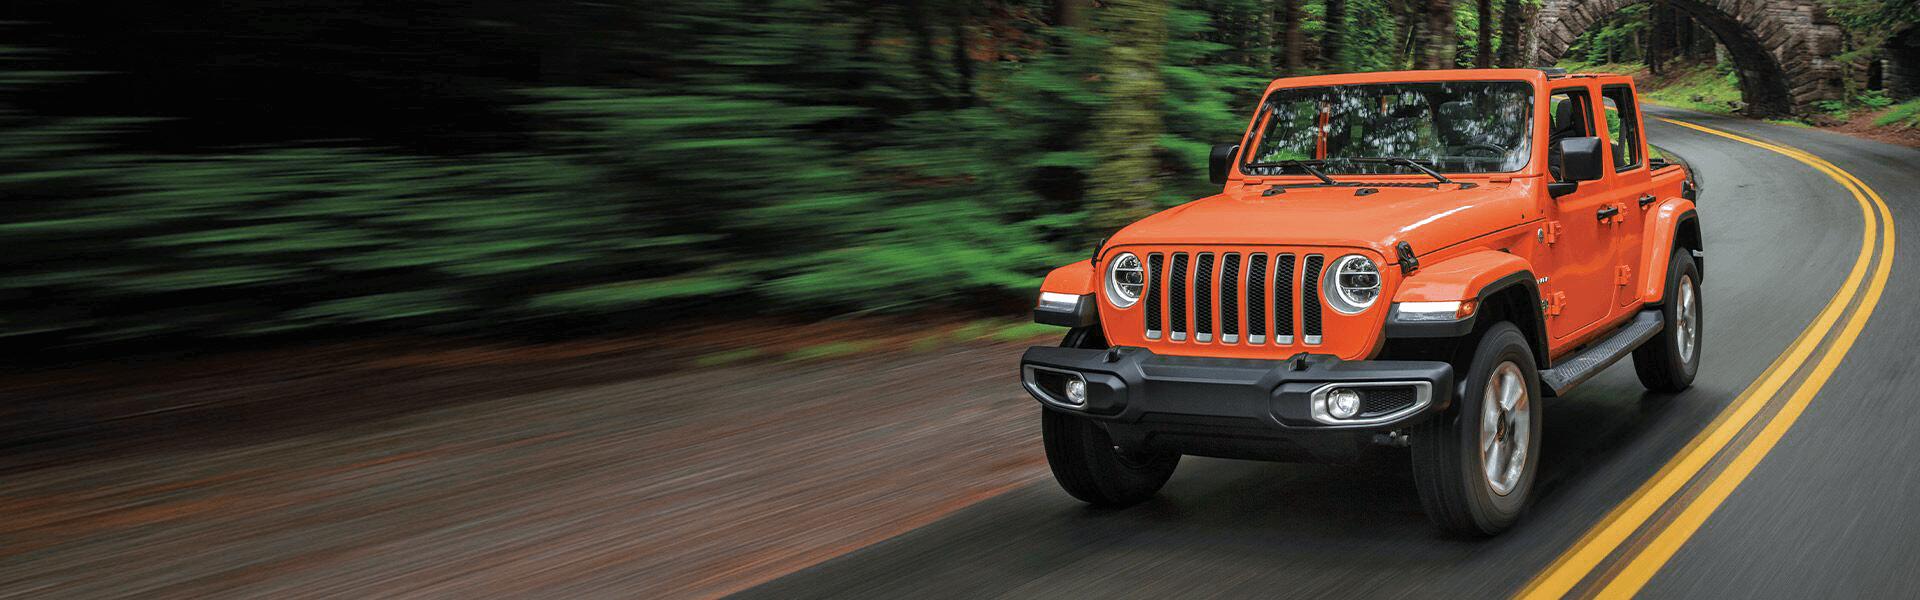 Used Jeep car image